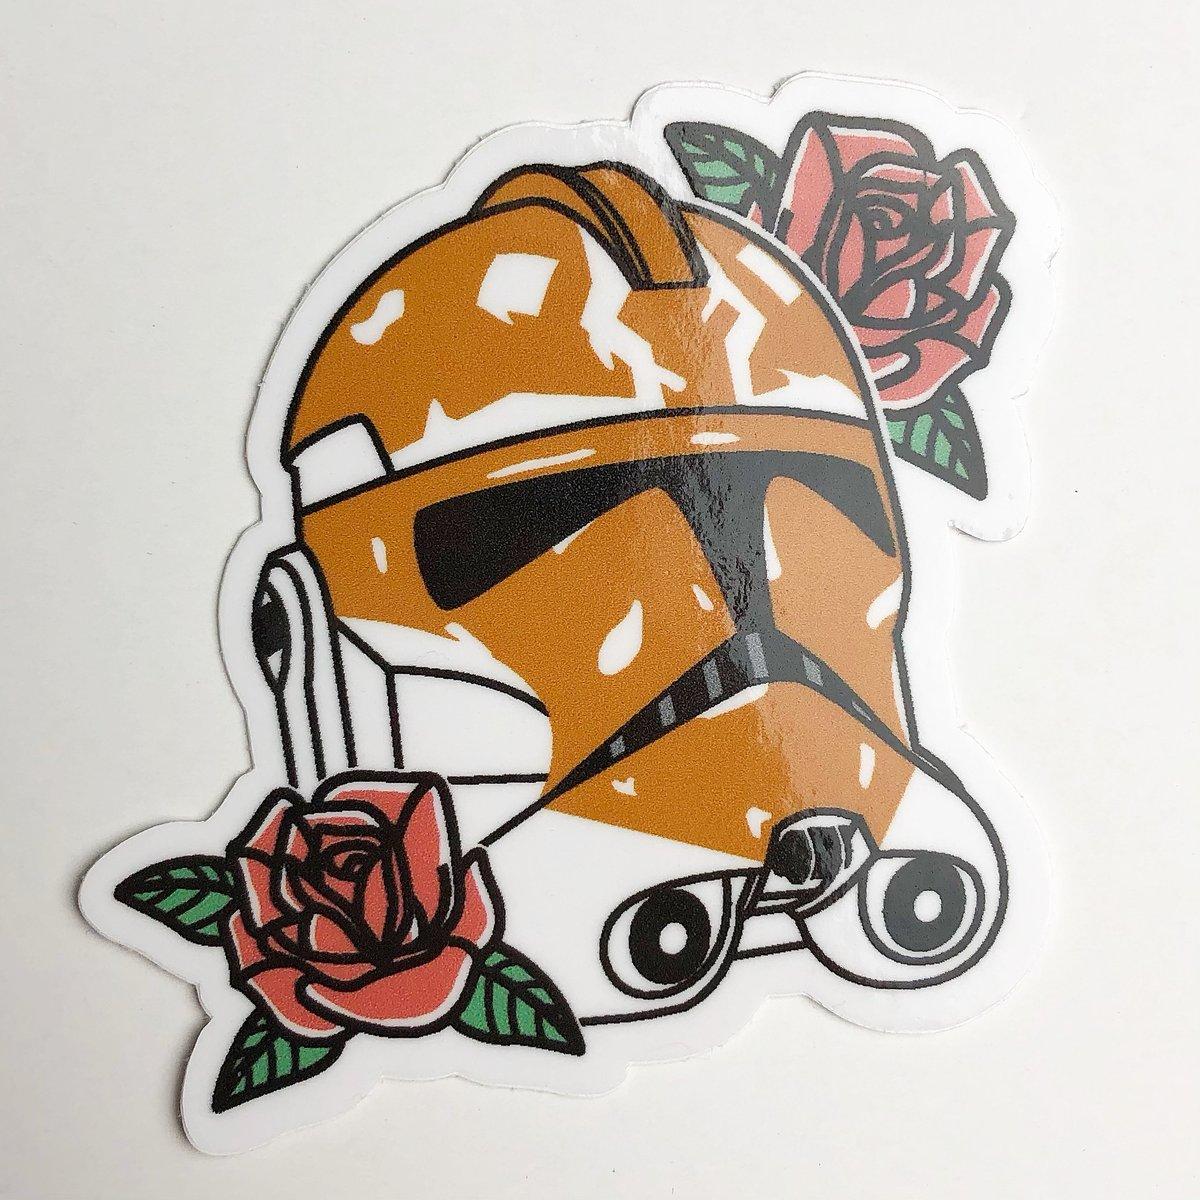 Image of 'Loyalty(332)' Sticker